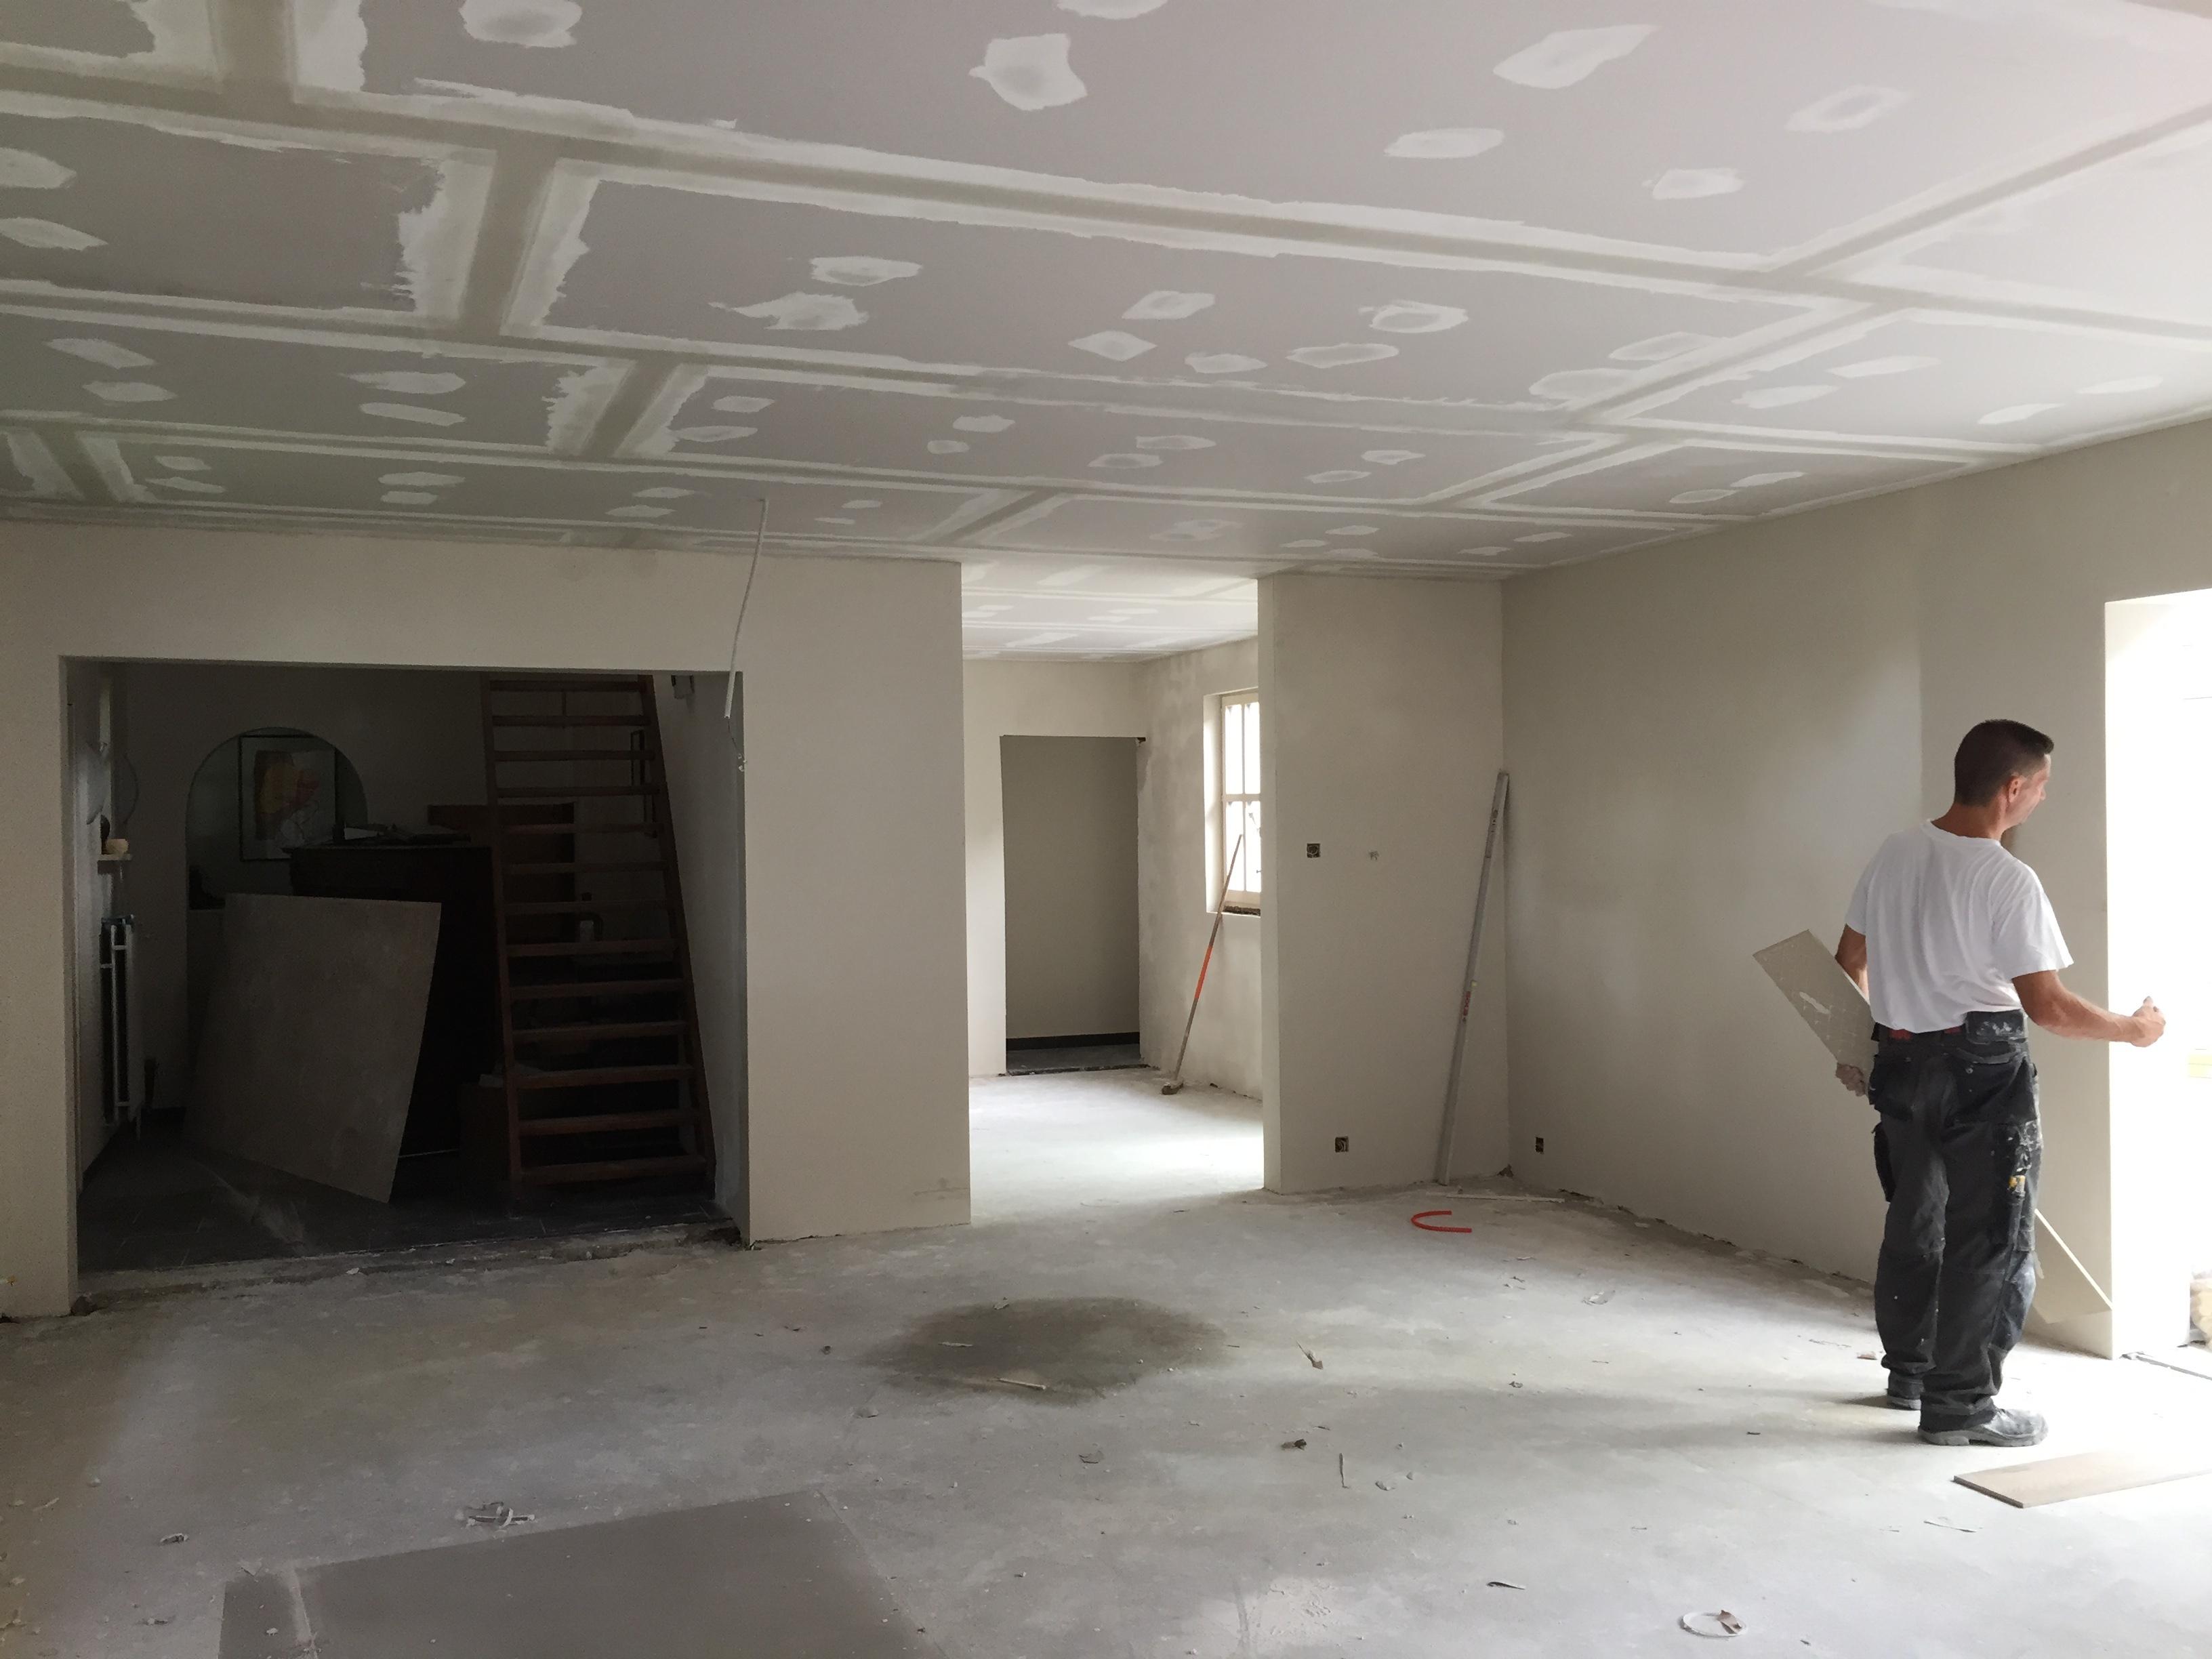 Afwerken gyprocplafond